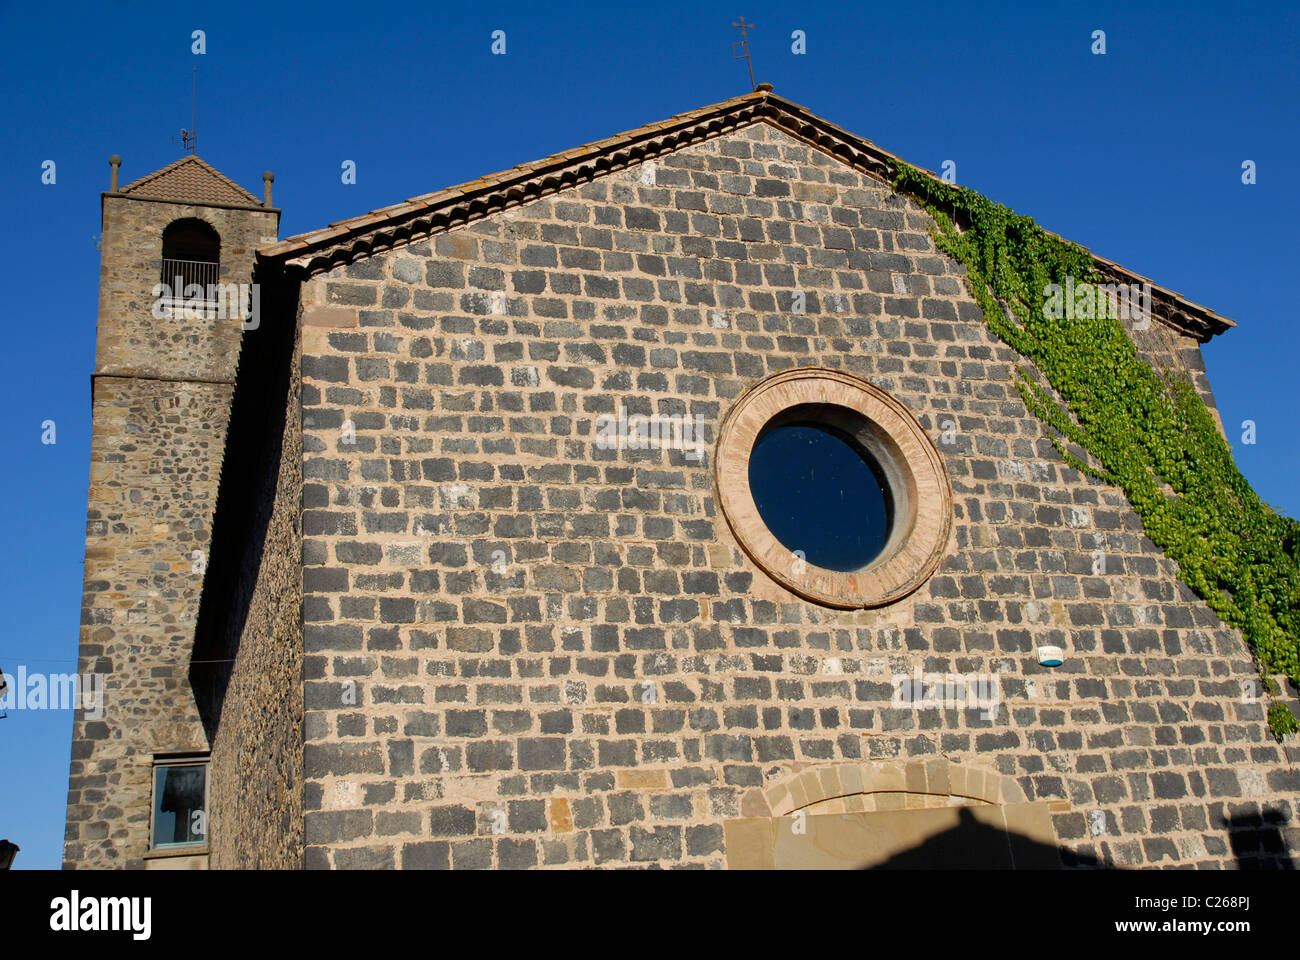 church in Castellfollit de la Roca, Parque Natural de la Zona Volcánica de la Garrotxa, Girona, Cataluña, - Stock Image